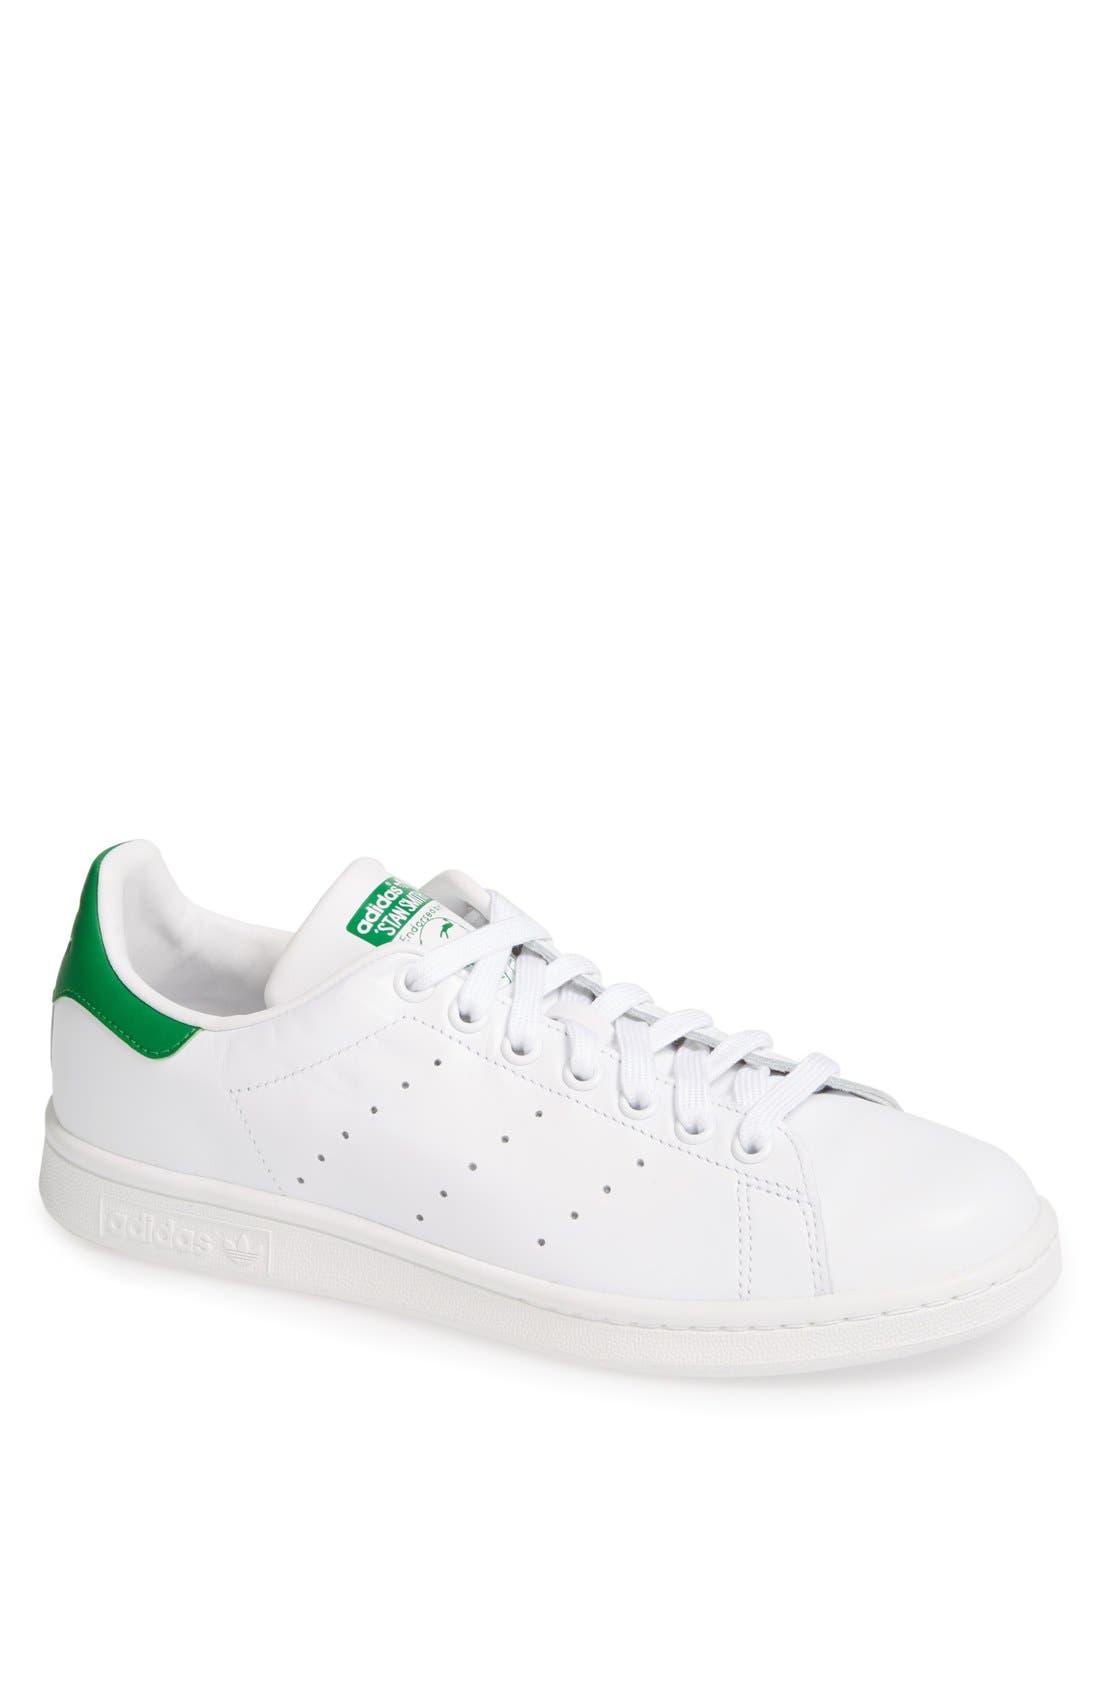 Main Image - adidas \u0027Stan Smith\u0027 Sneaker ...